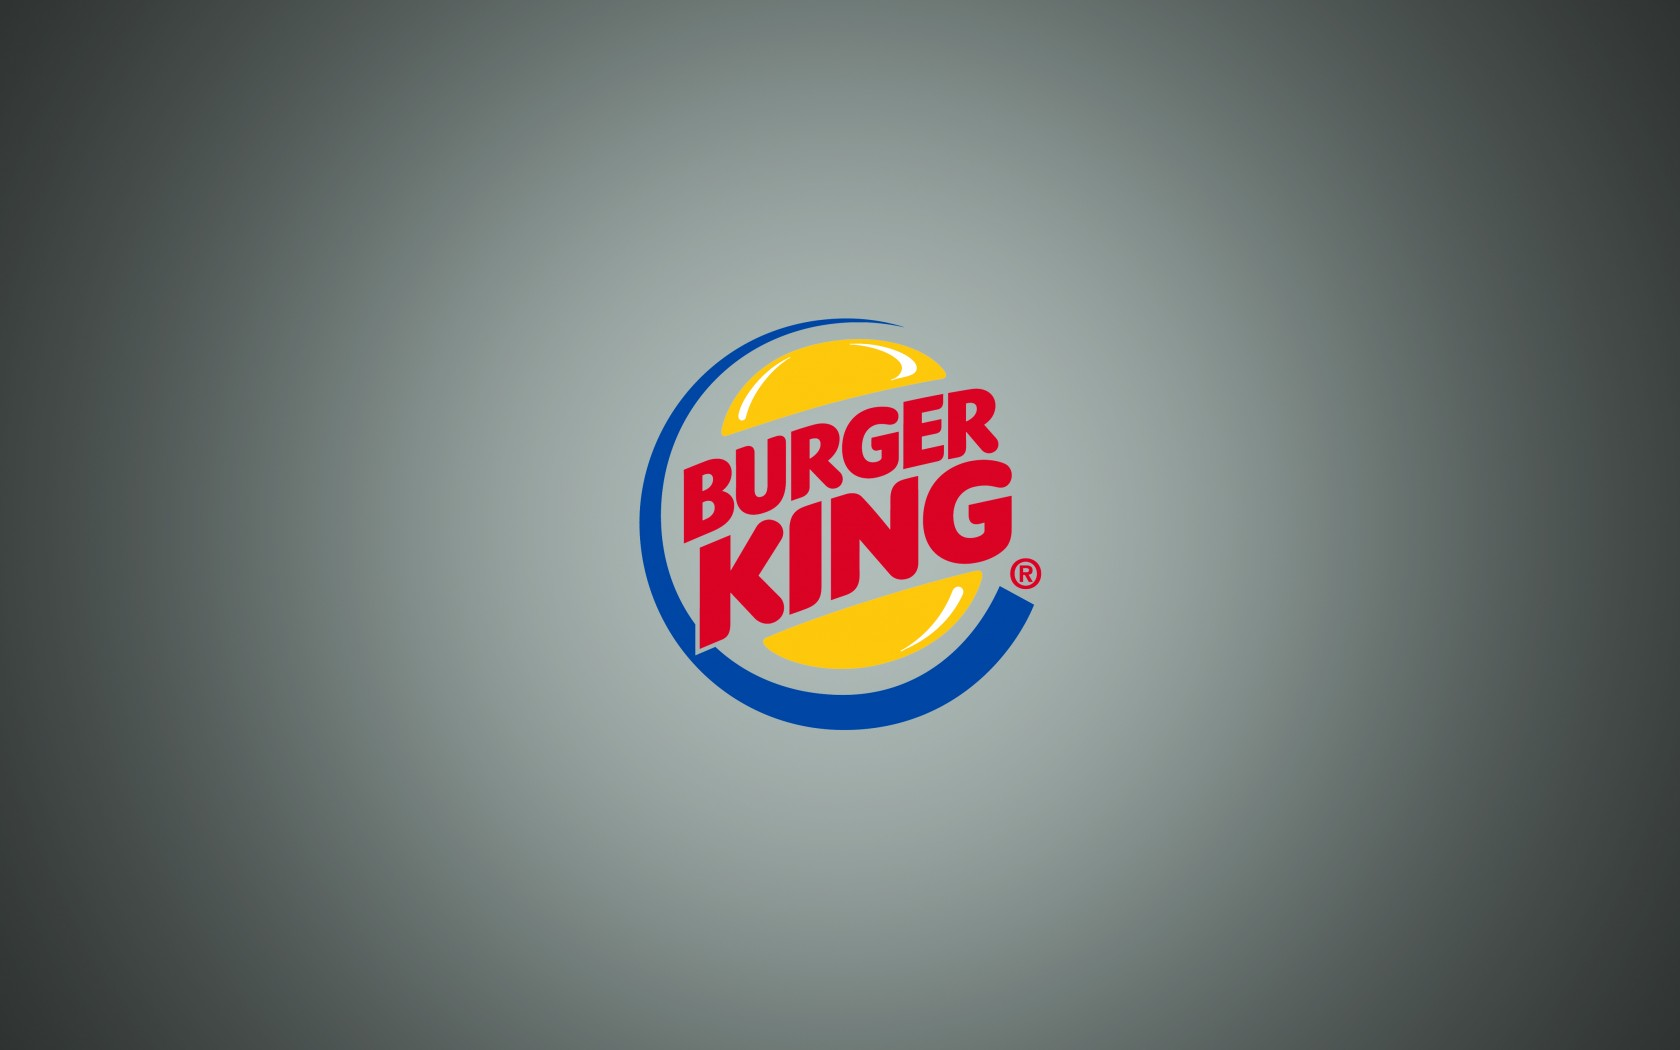 Burger King Wallpaper